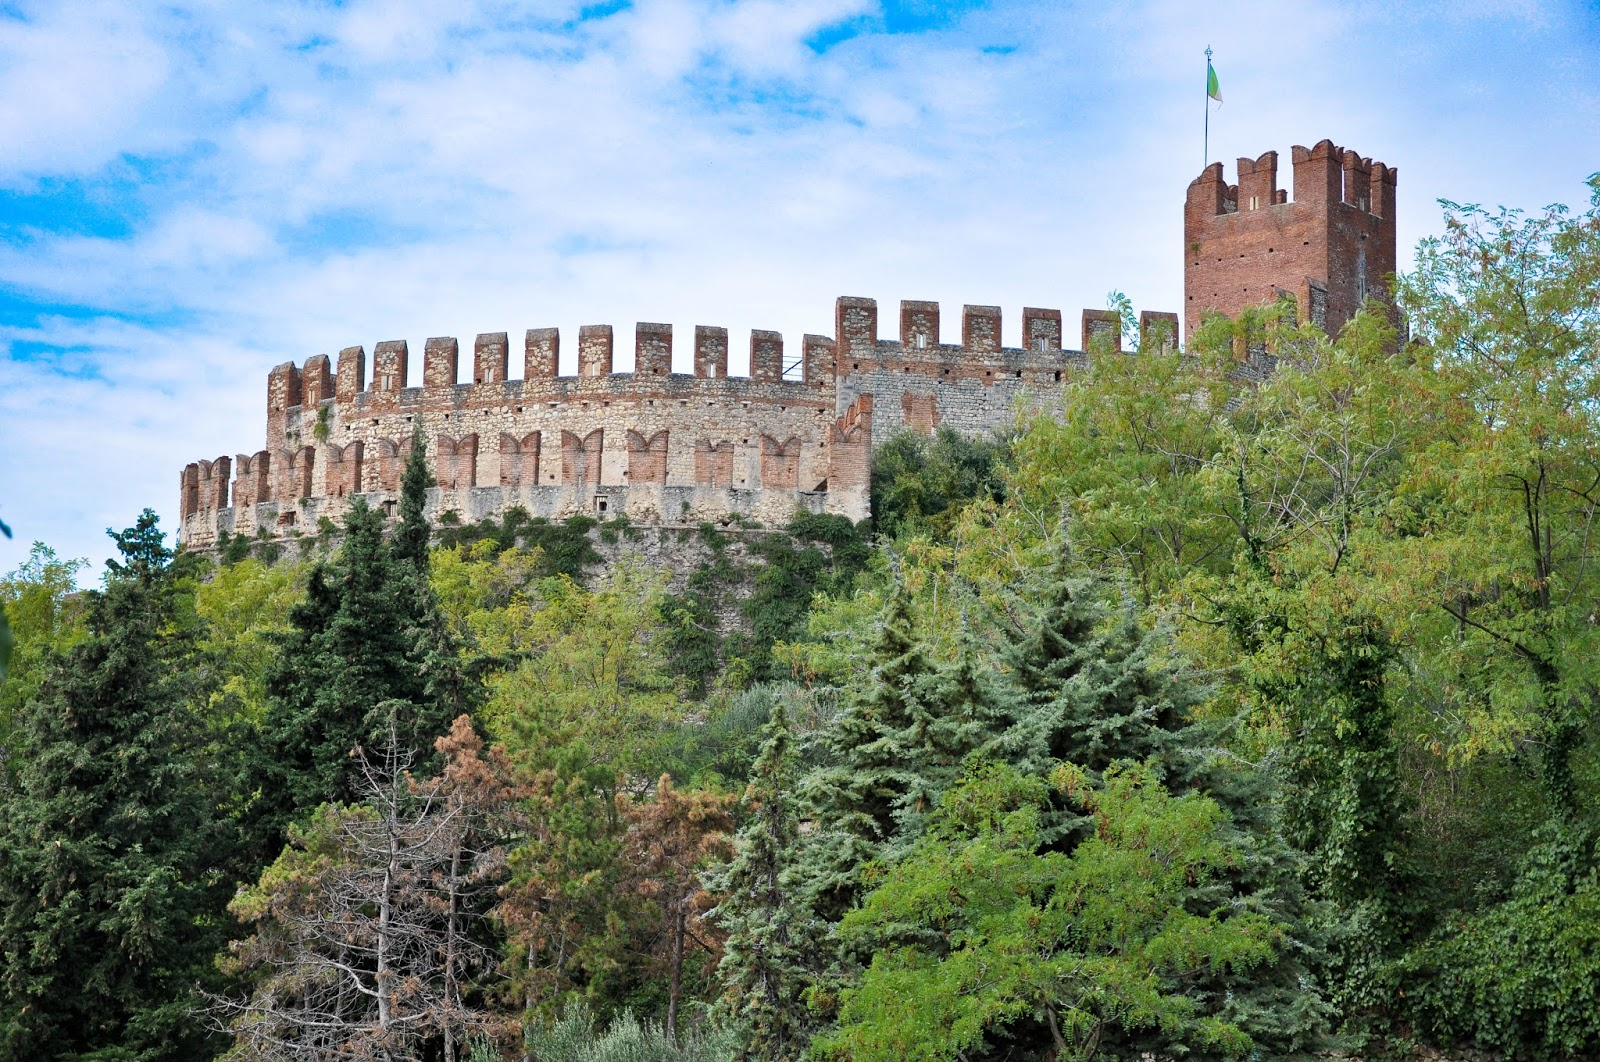 Soave Castle, Soave, Veneto, Italy